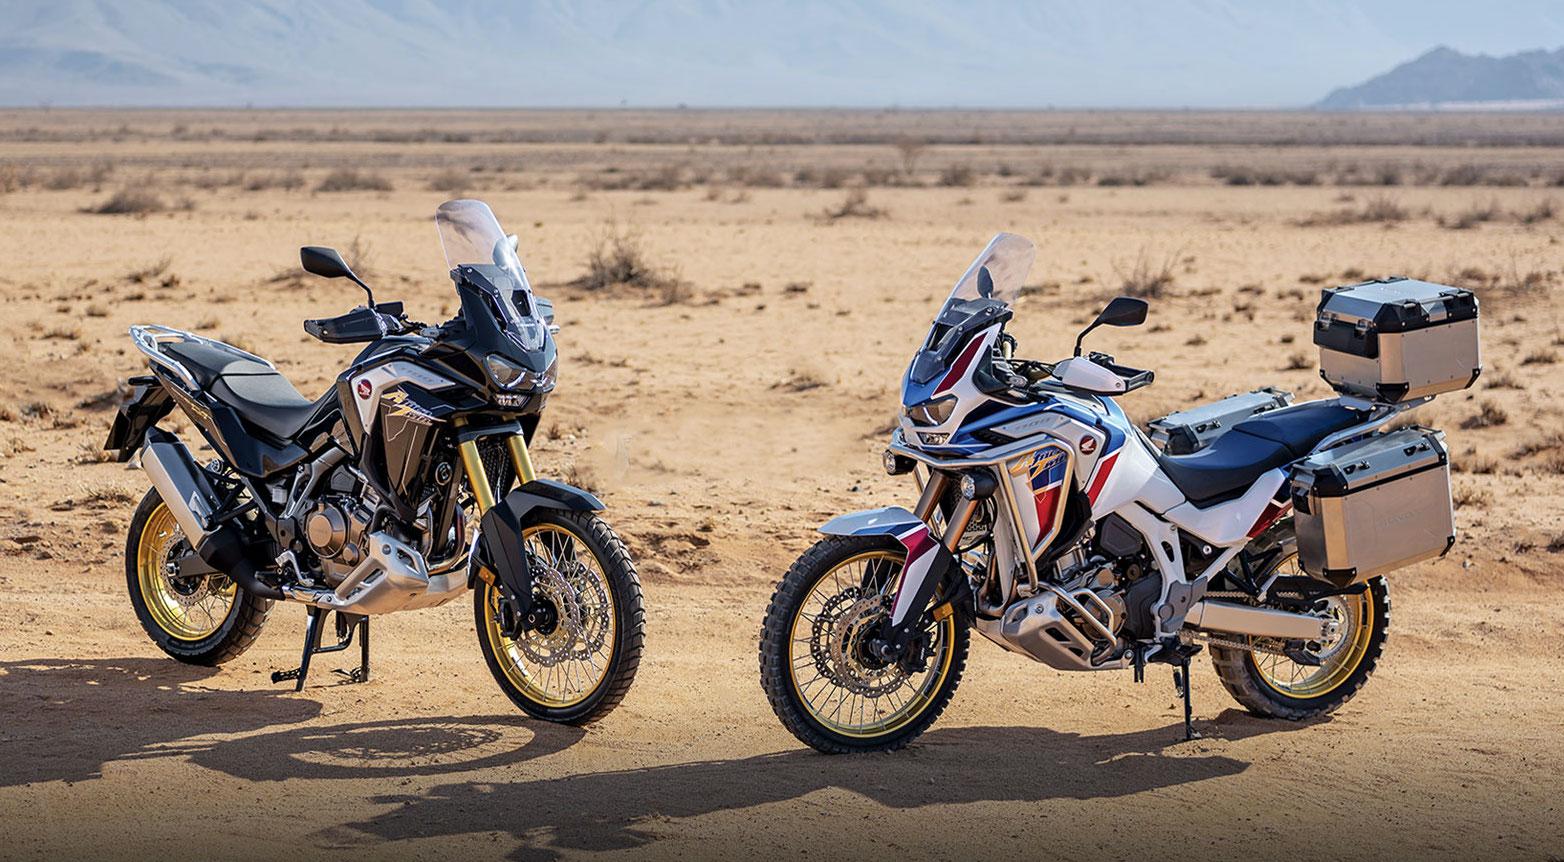 2020 Honda Africa Twin India